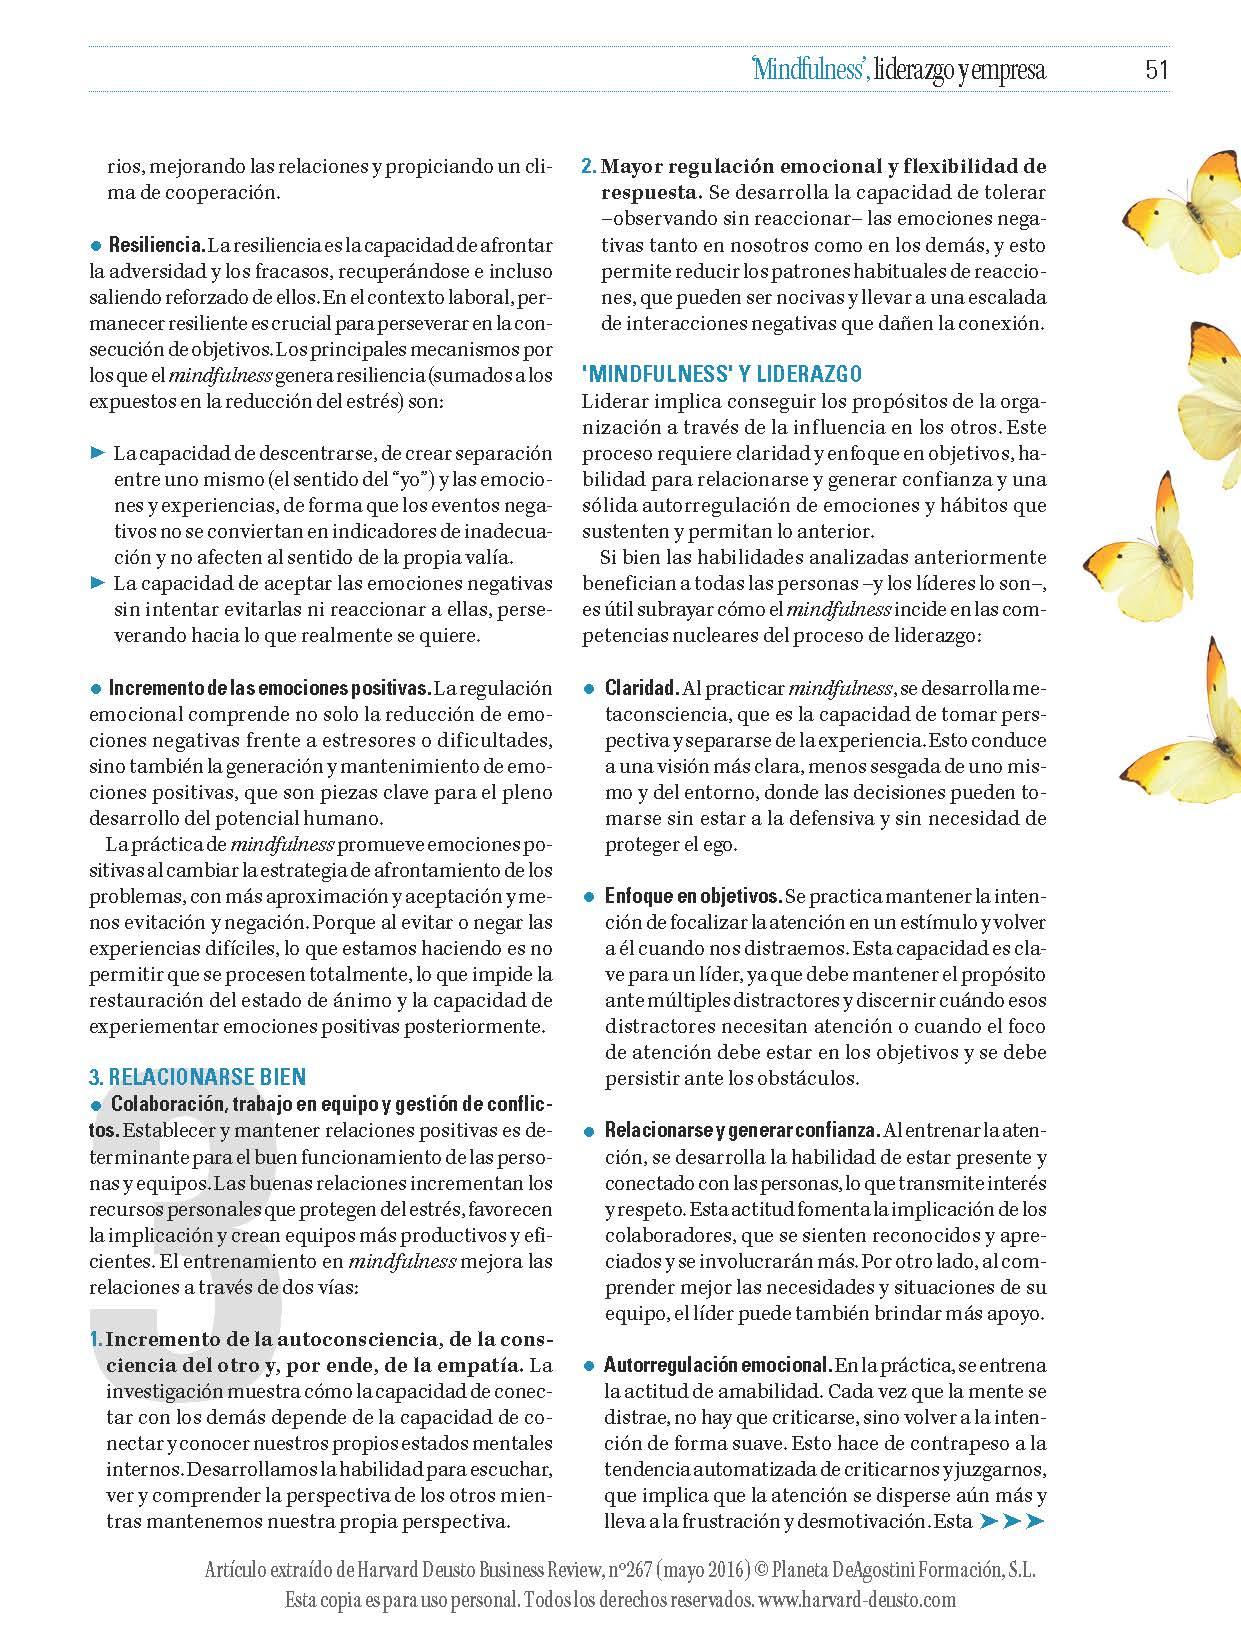 mindfulness y empresas. HBR. Estrella (2017)_Página_8.jpg